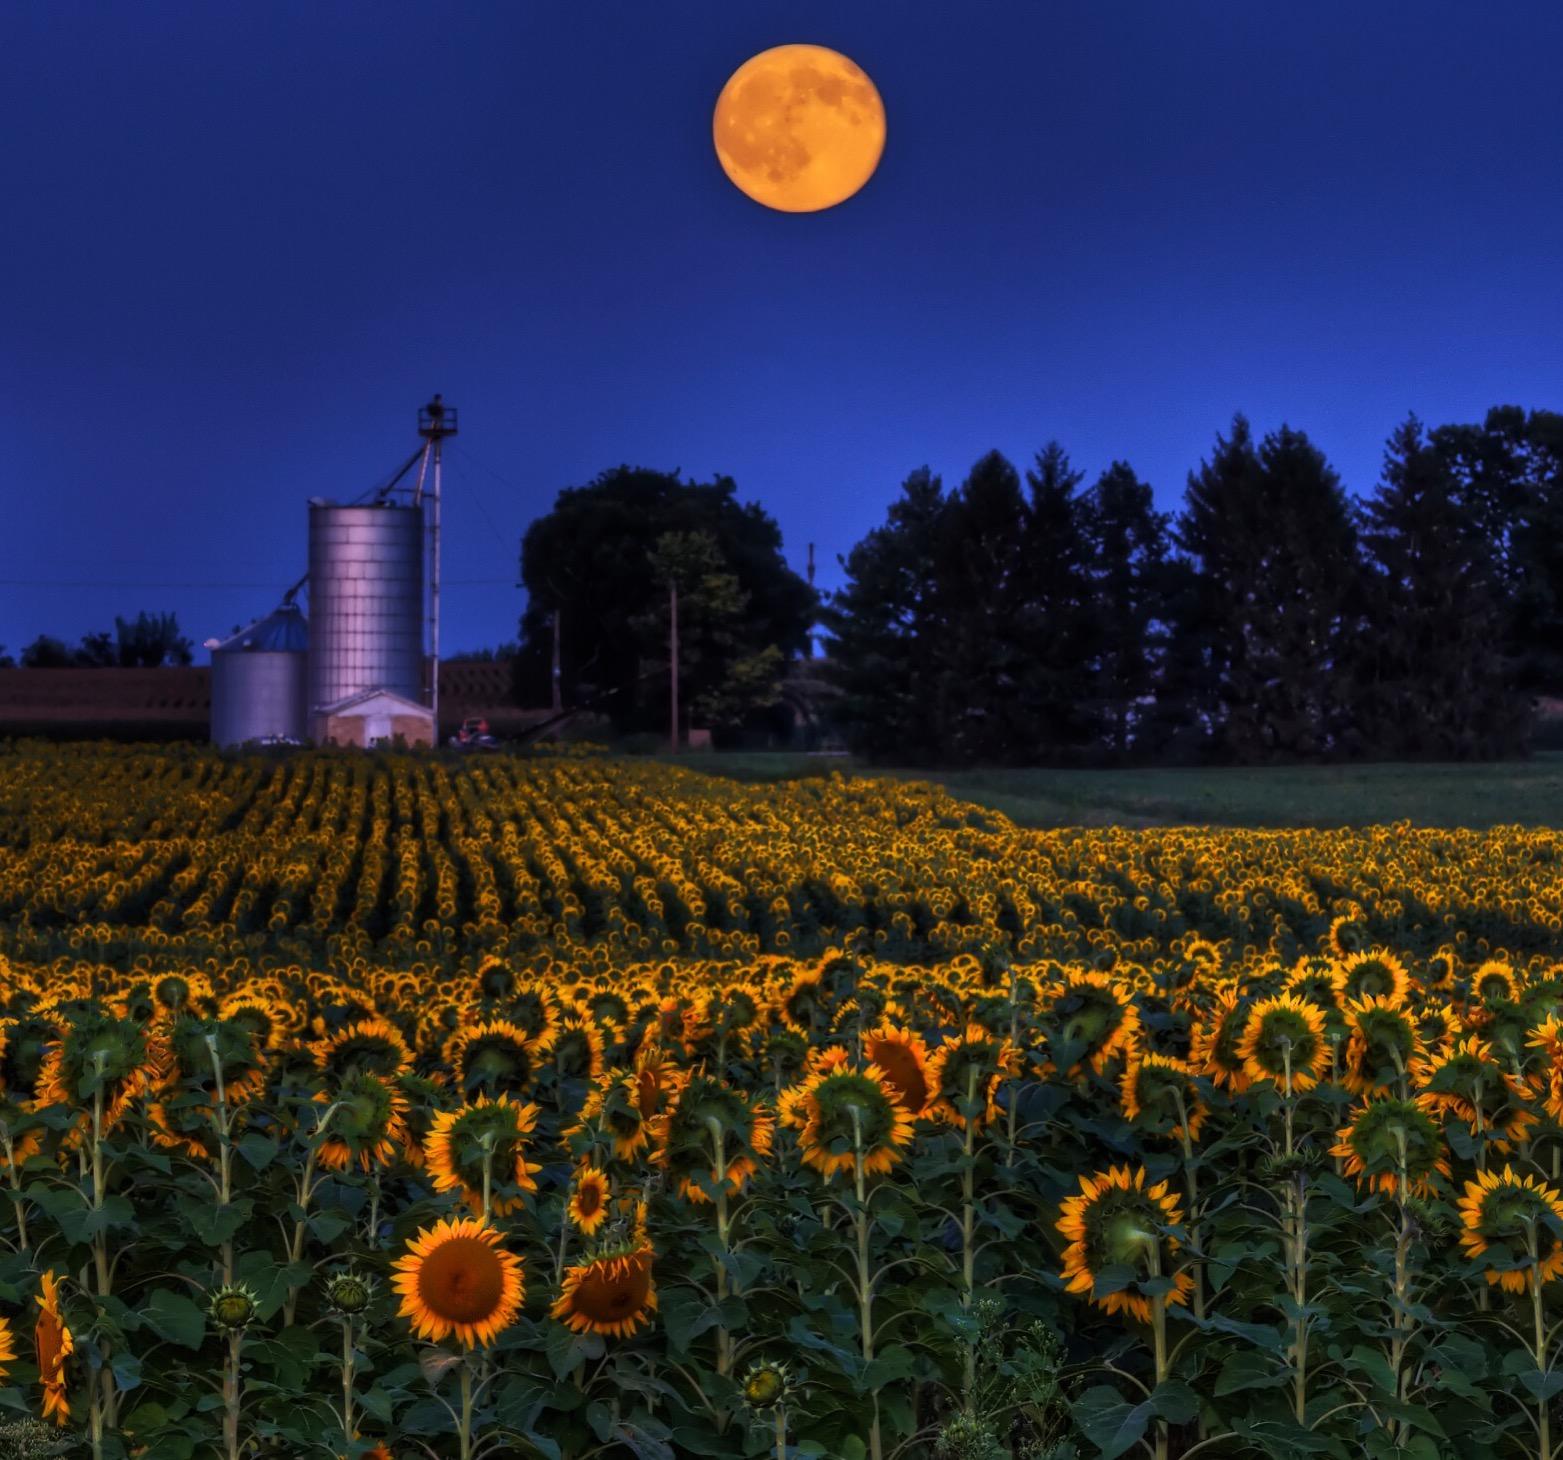 Photo by @jimcrottyphotog in Yellow Springs, Ohio